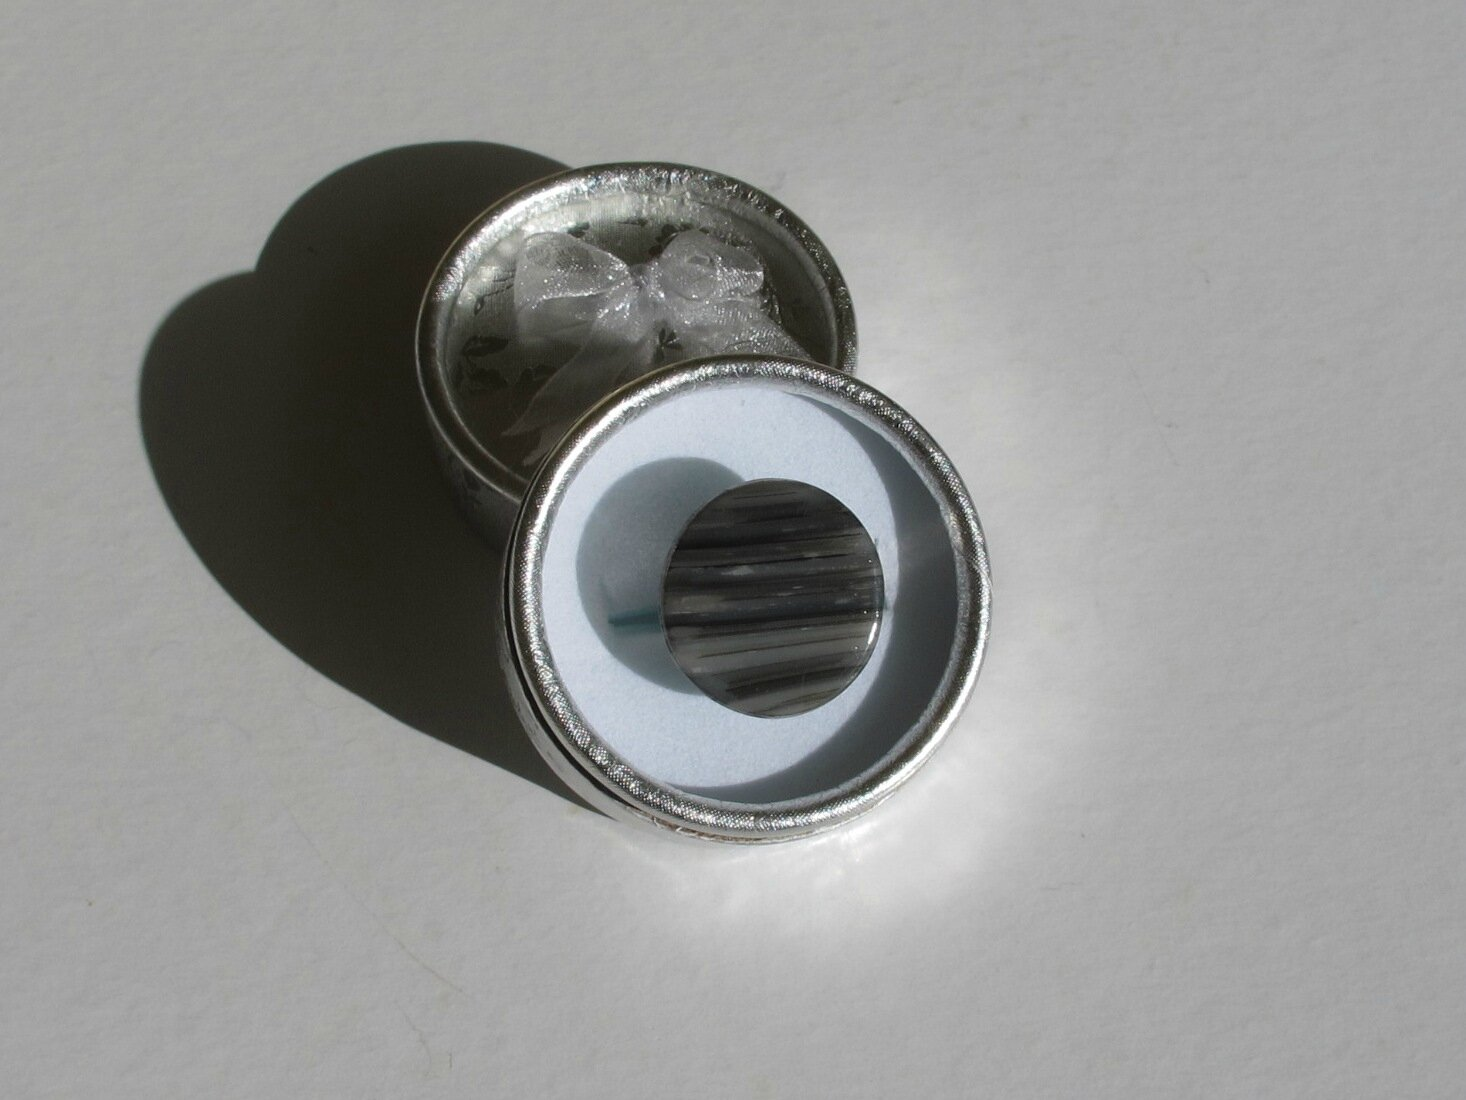 bague fimo ronde transparente grise boite